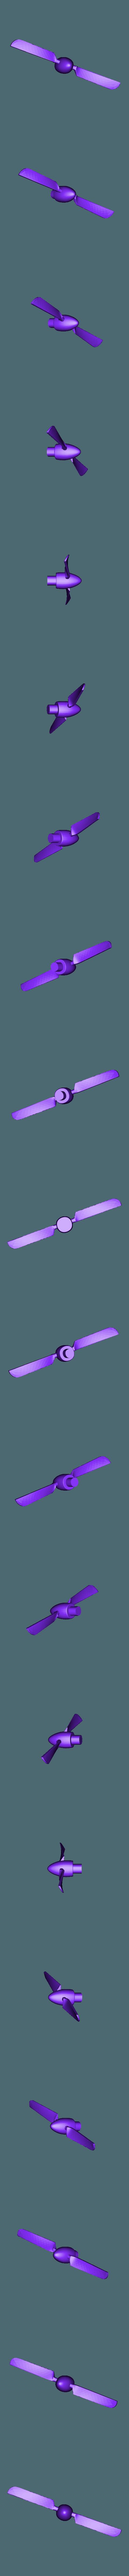 cono_helices.STL Download STL file Rutan Long EZ • 3D print design, Nico_3D